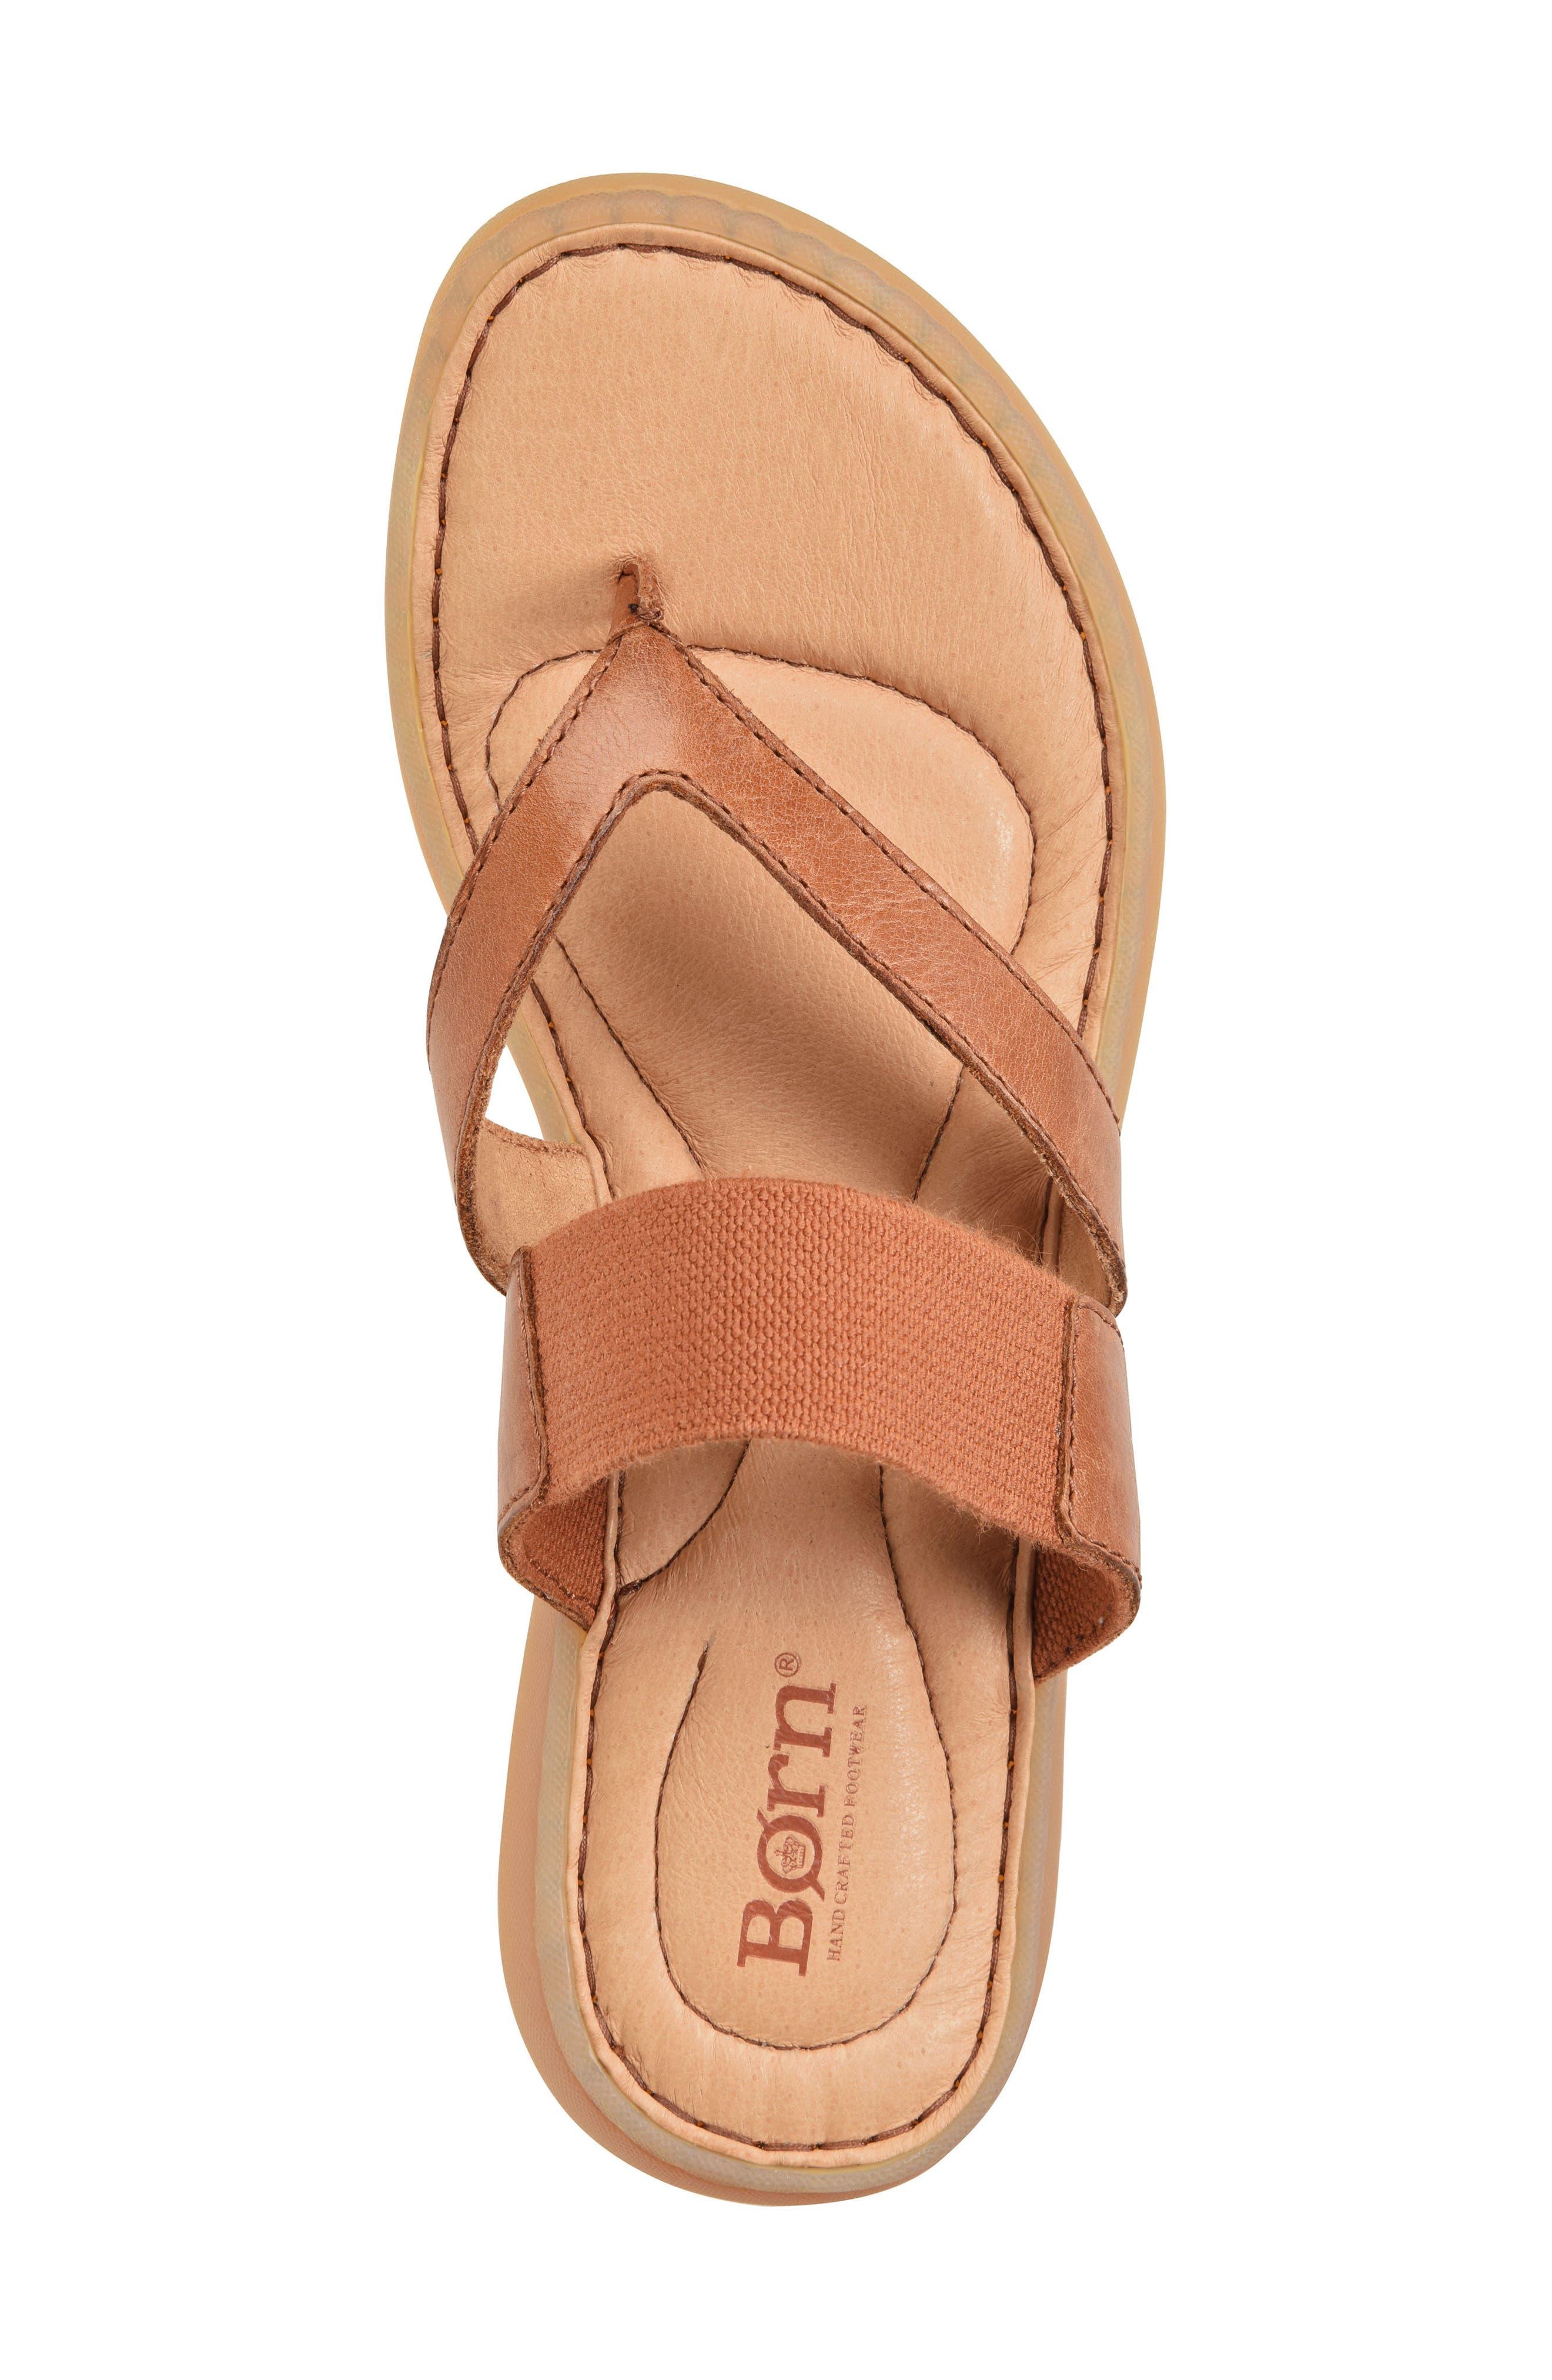 Nevis Sandal,                             Alternate thumbnail 5, color,                             Brown Leather